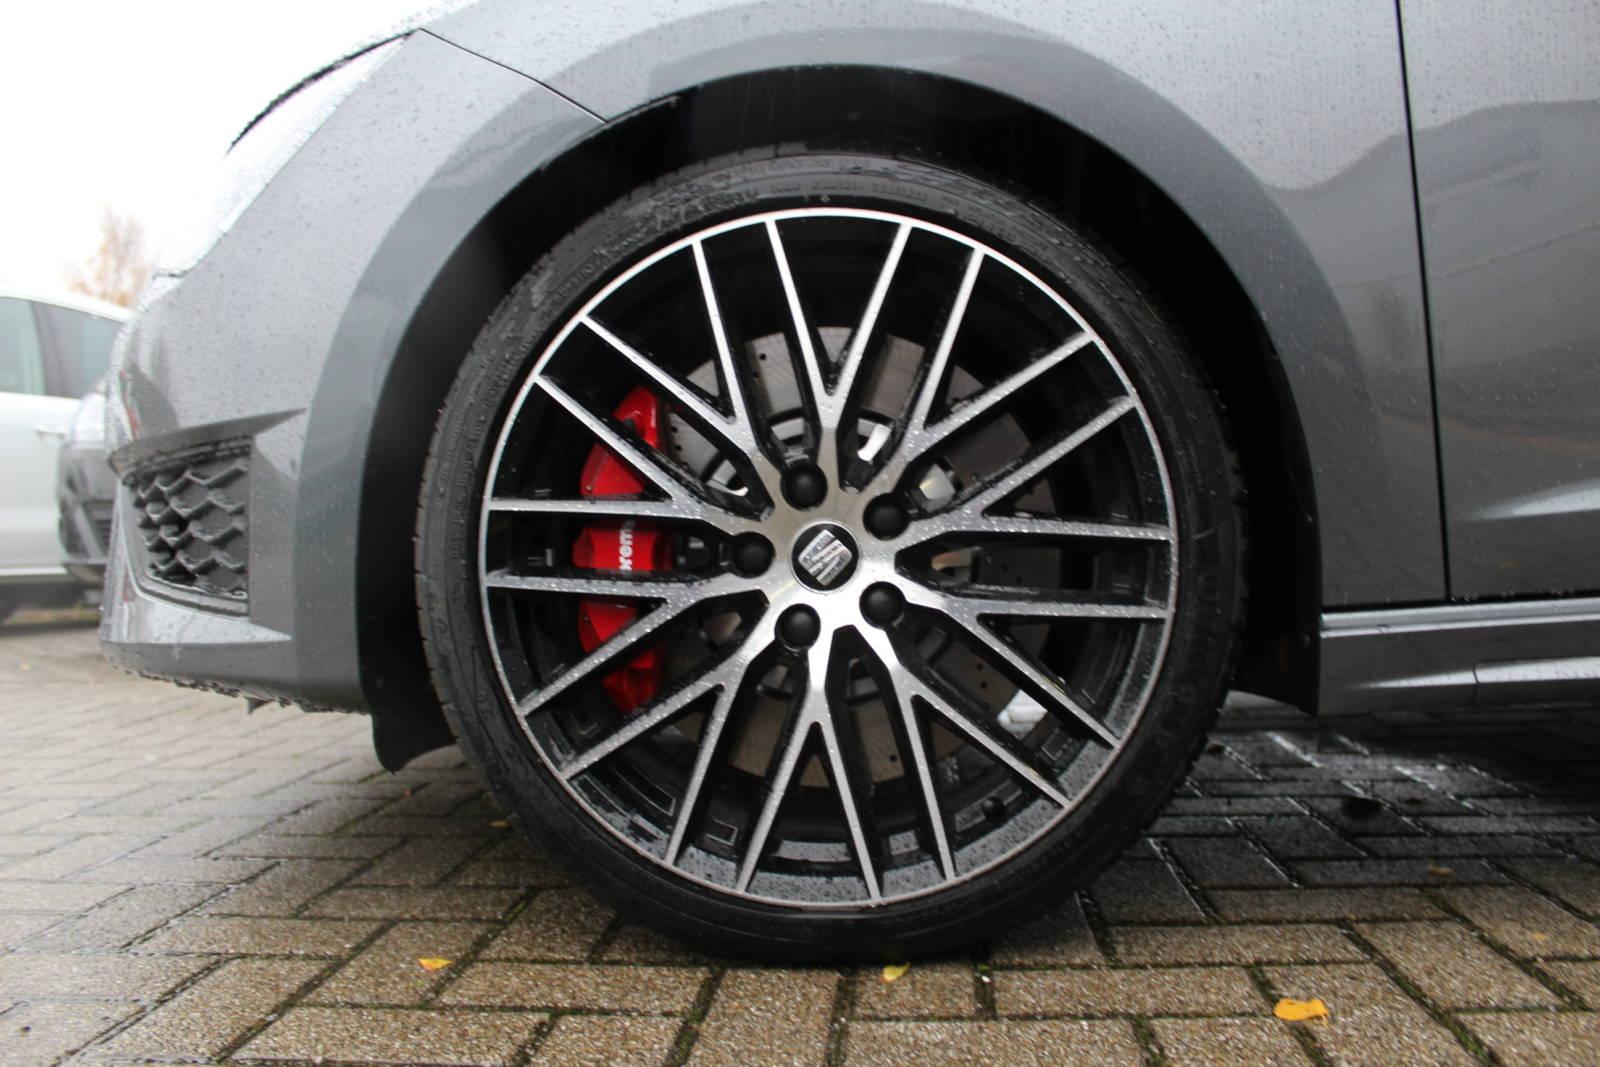 Seat Leon Cupra Limousine 2.0 TSI 6-Gang / Deutsche Neufahrzeuge und EU-Neufahrzeuge – Aha! Fahrzeughandel GmbH in Althengstett